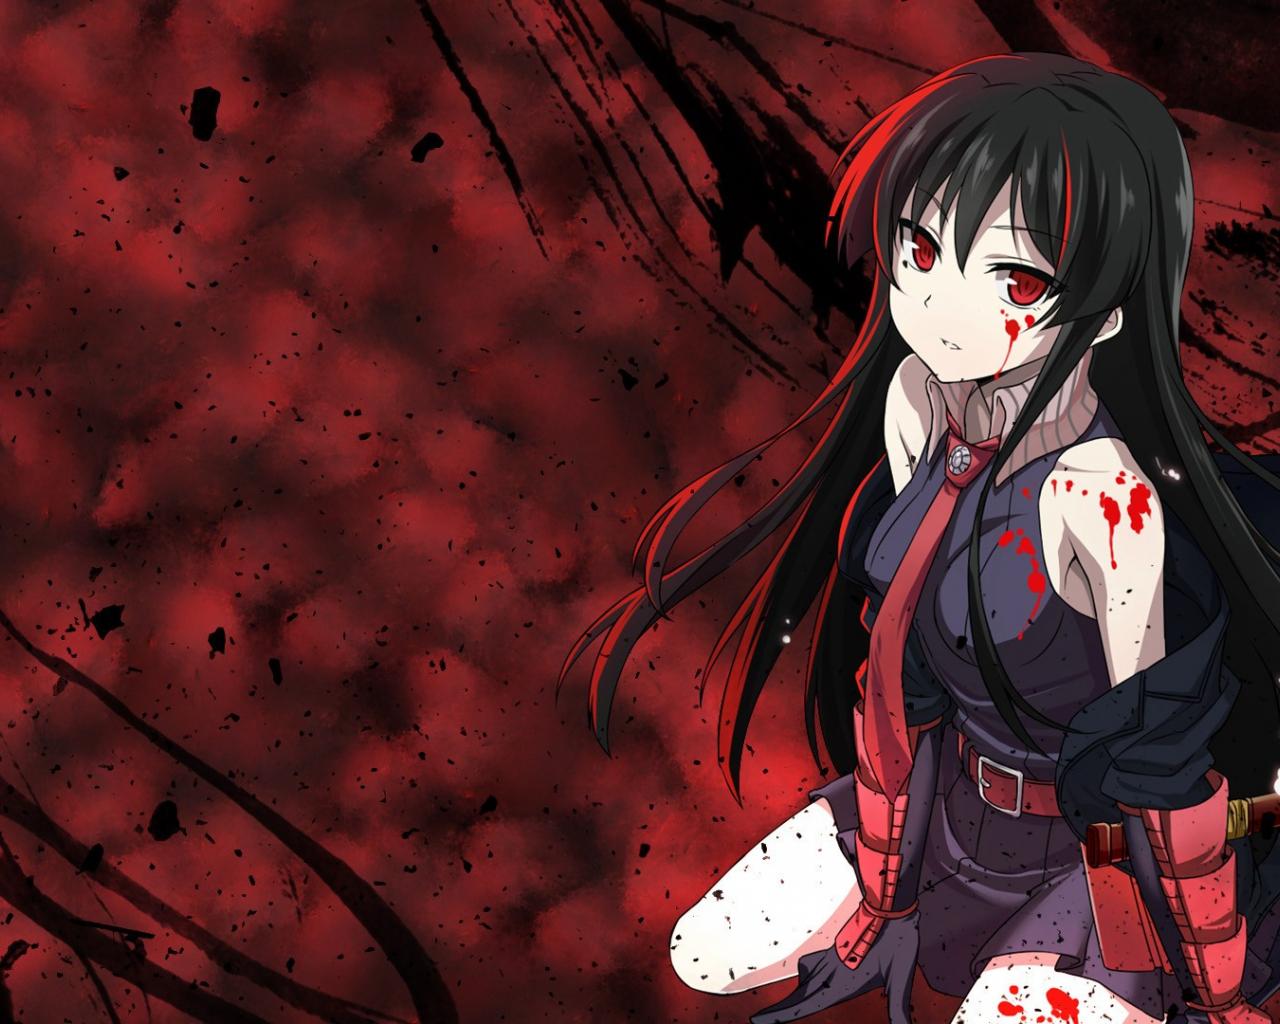 Free Download Anime Girls Akame Ga Kill Akame Wallpaper Anime